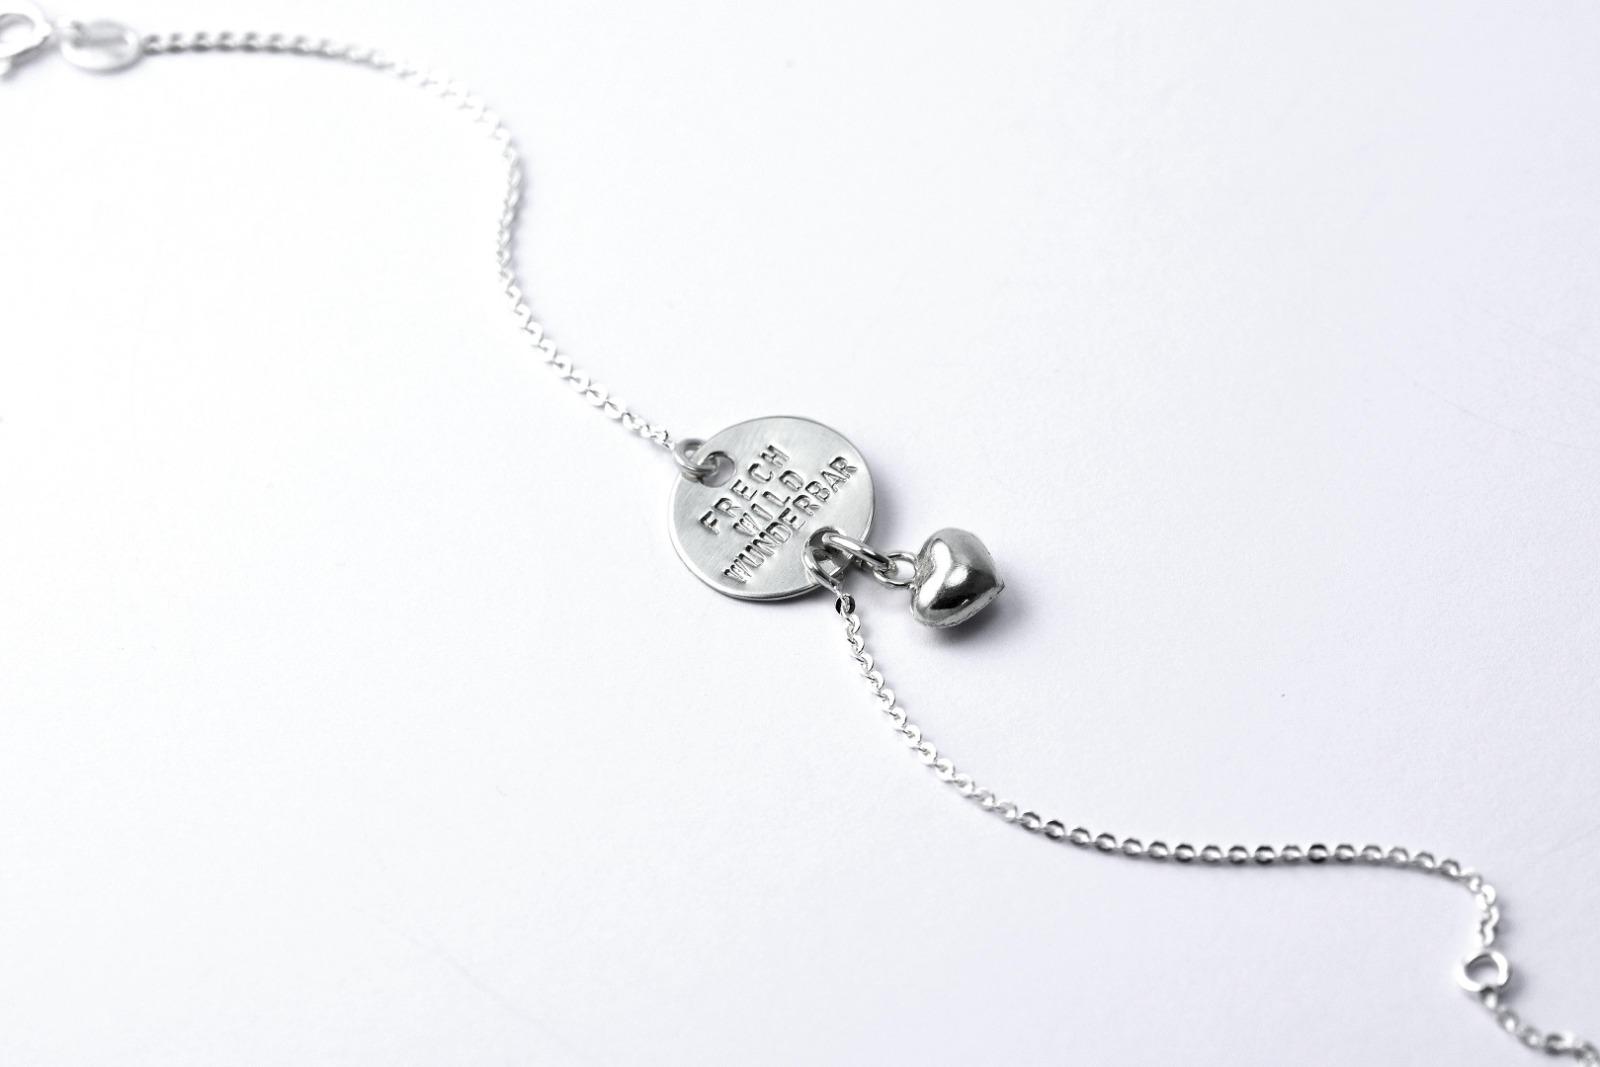 Zartes Silberarmband 1 - Namens- Geburts-